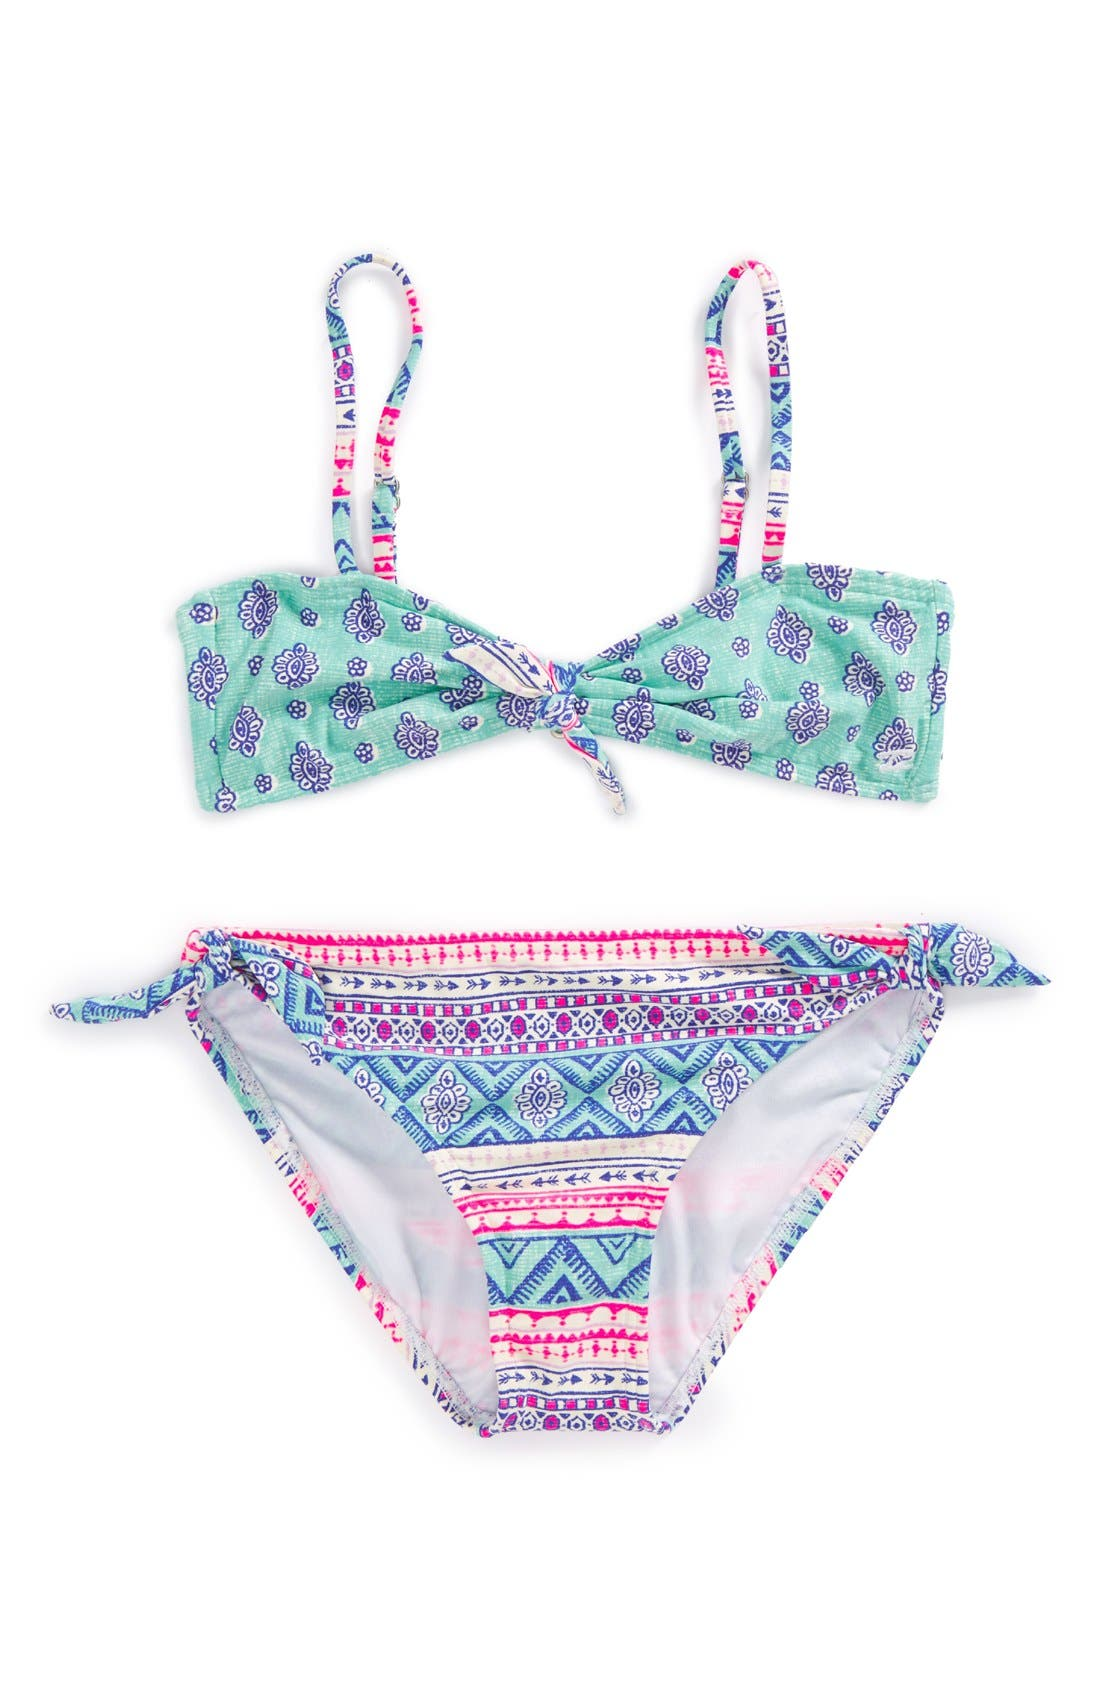 Main Image - Billabong 'Hippie Chic' Two-Piece Bandeau Swimsuit (Big Girls)